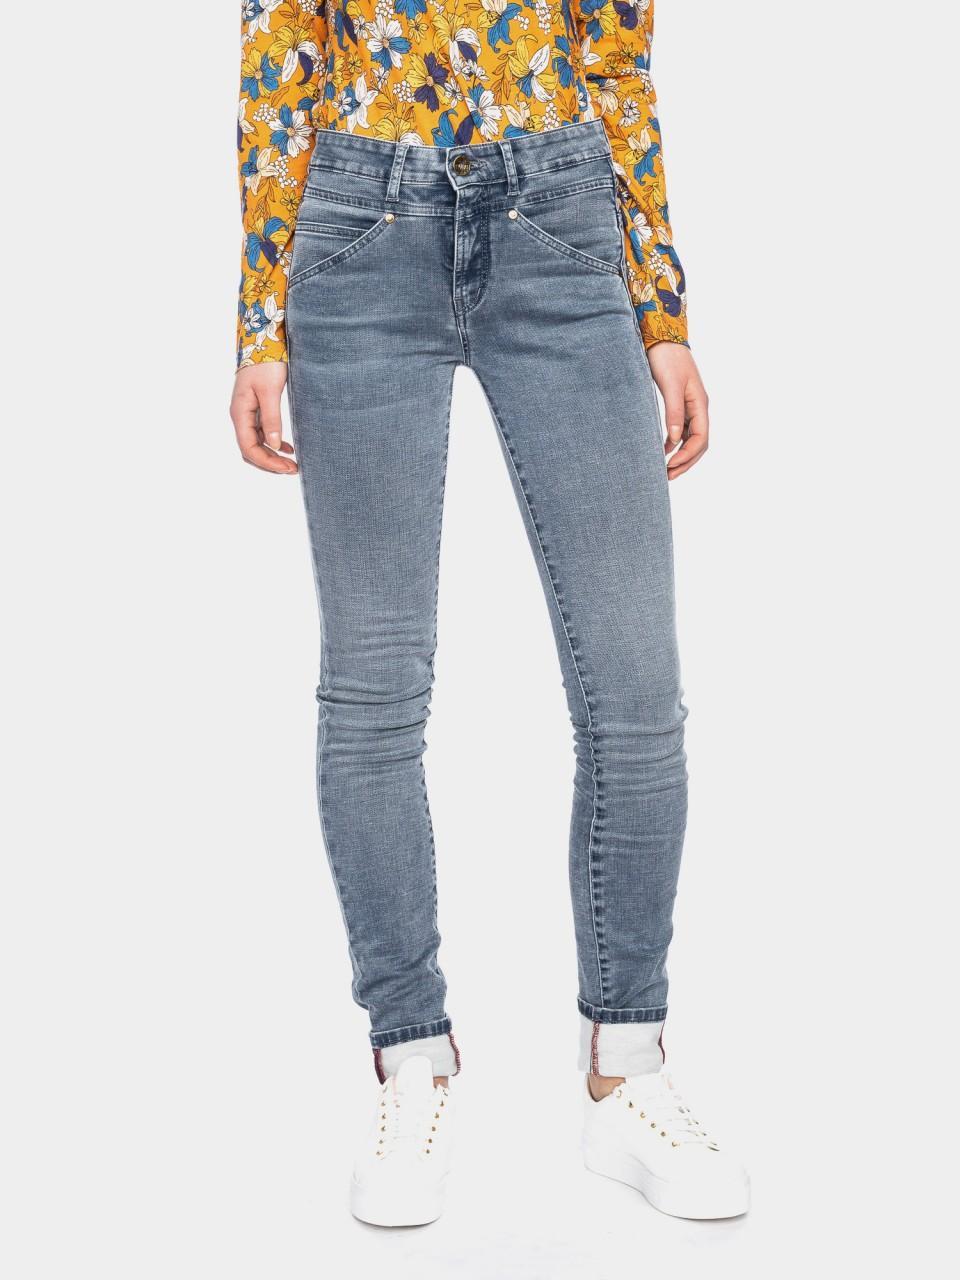 Jeans Kandy Celio Blue HBL USD